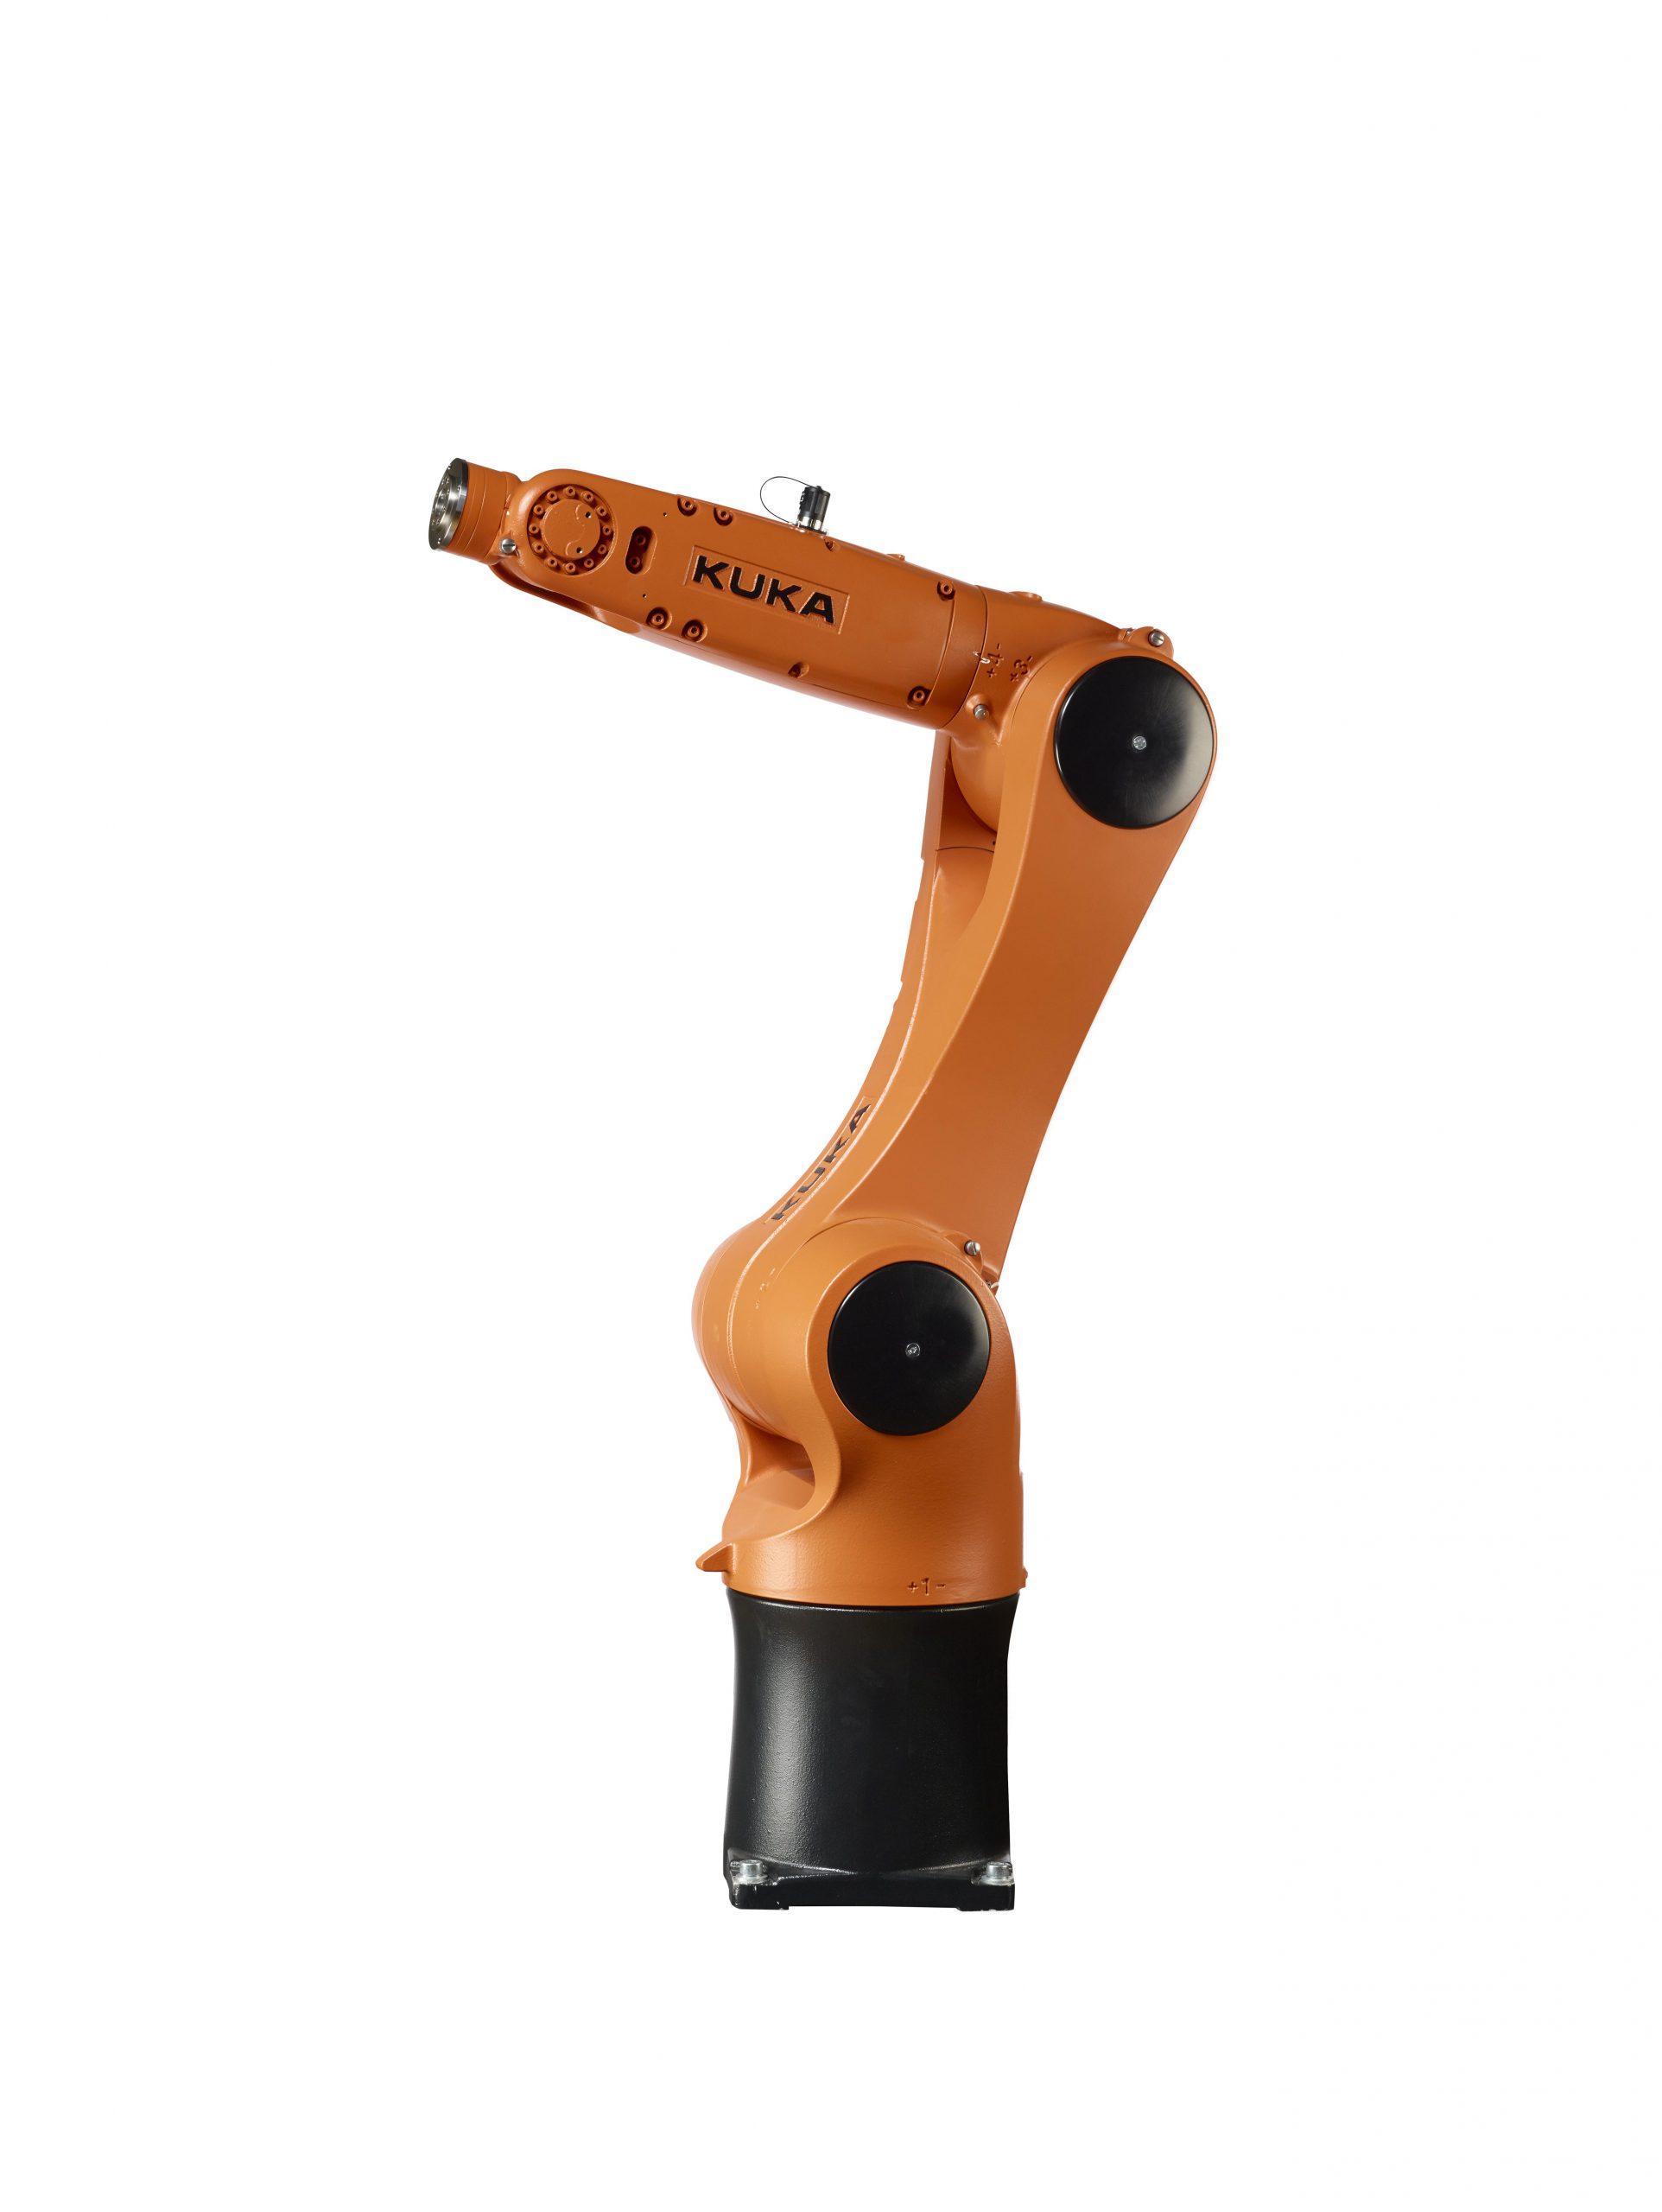 KUKA KR 10 R900 sixx (KR AGILUS)